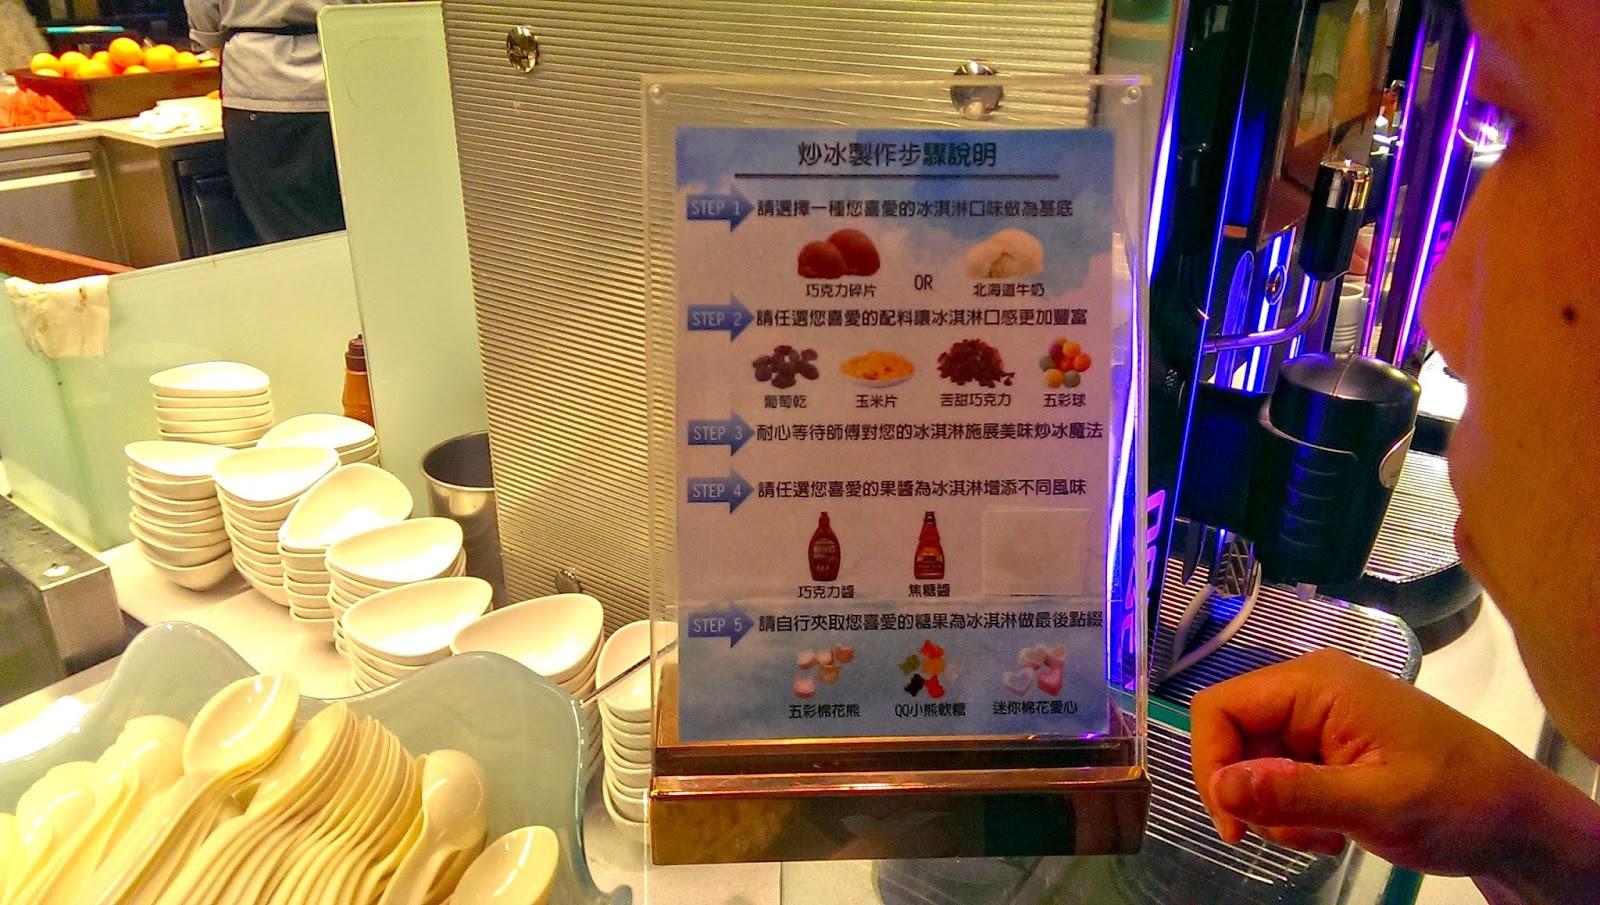 2015 07 01%2B19.05.47 - [食記] 台北京站 - 饗食天堂,有生魚片吃到飽的高級自助餐廳!